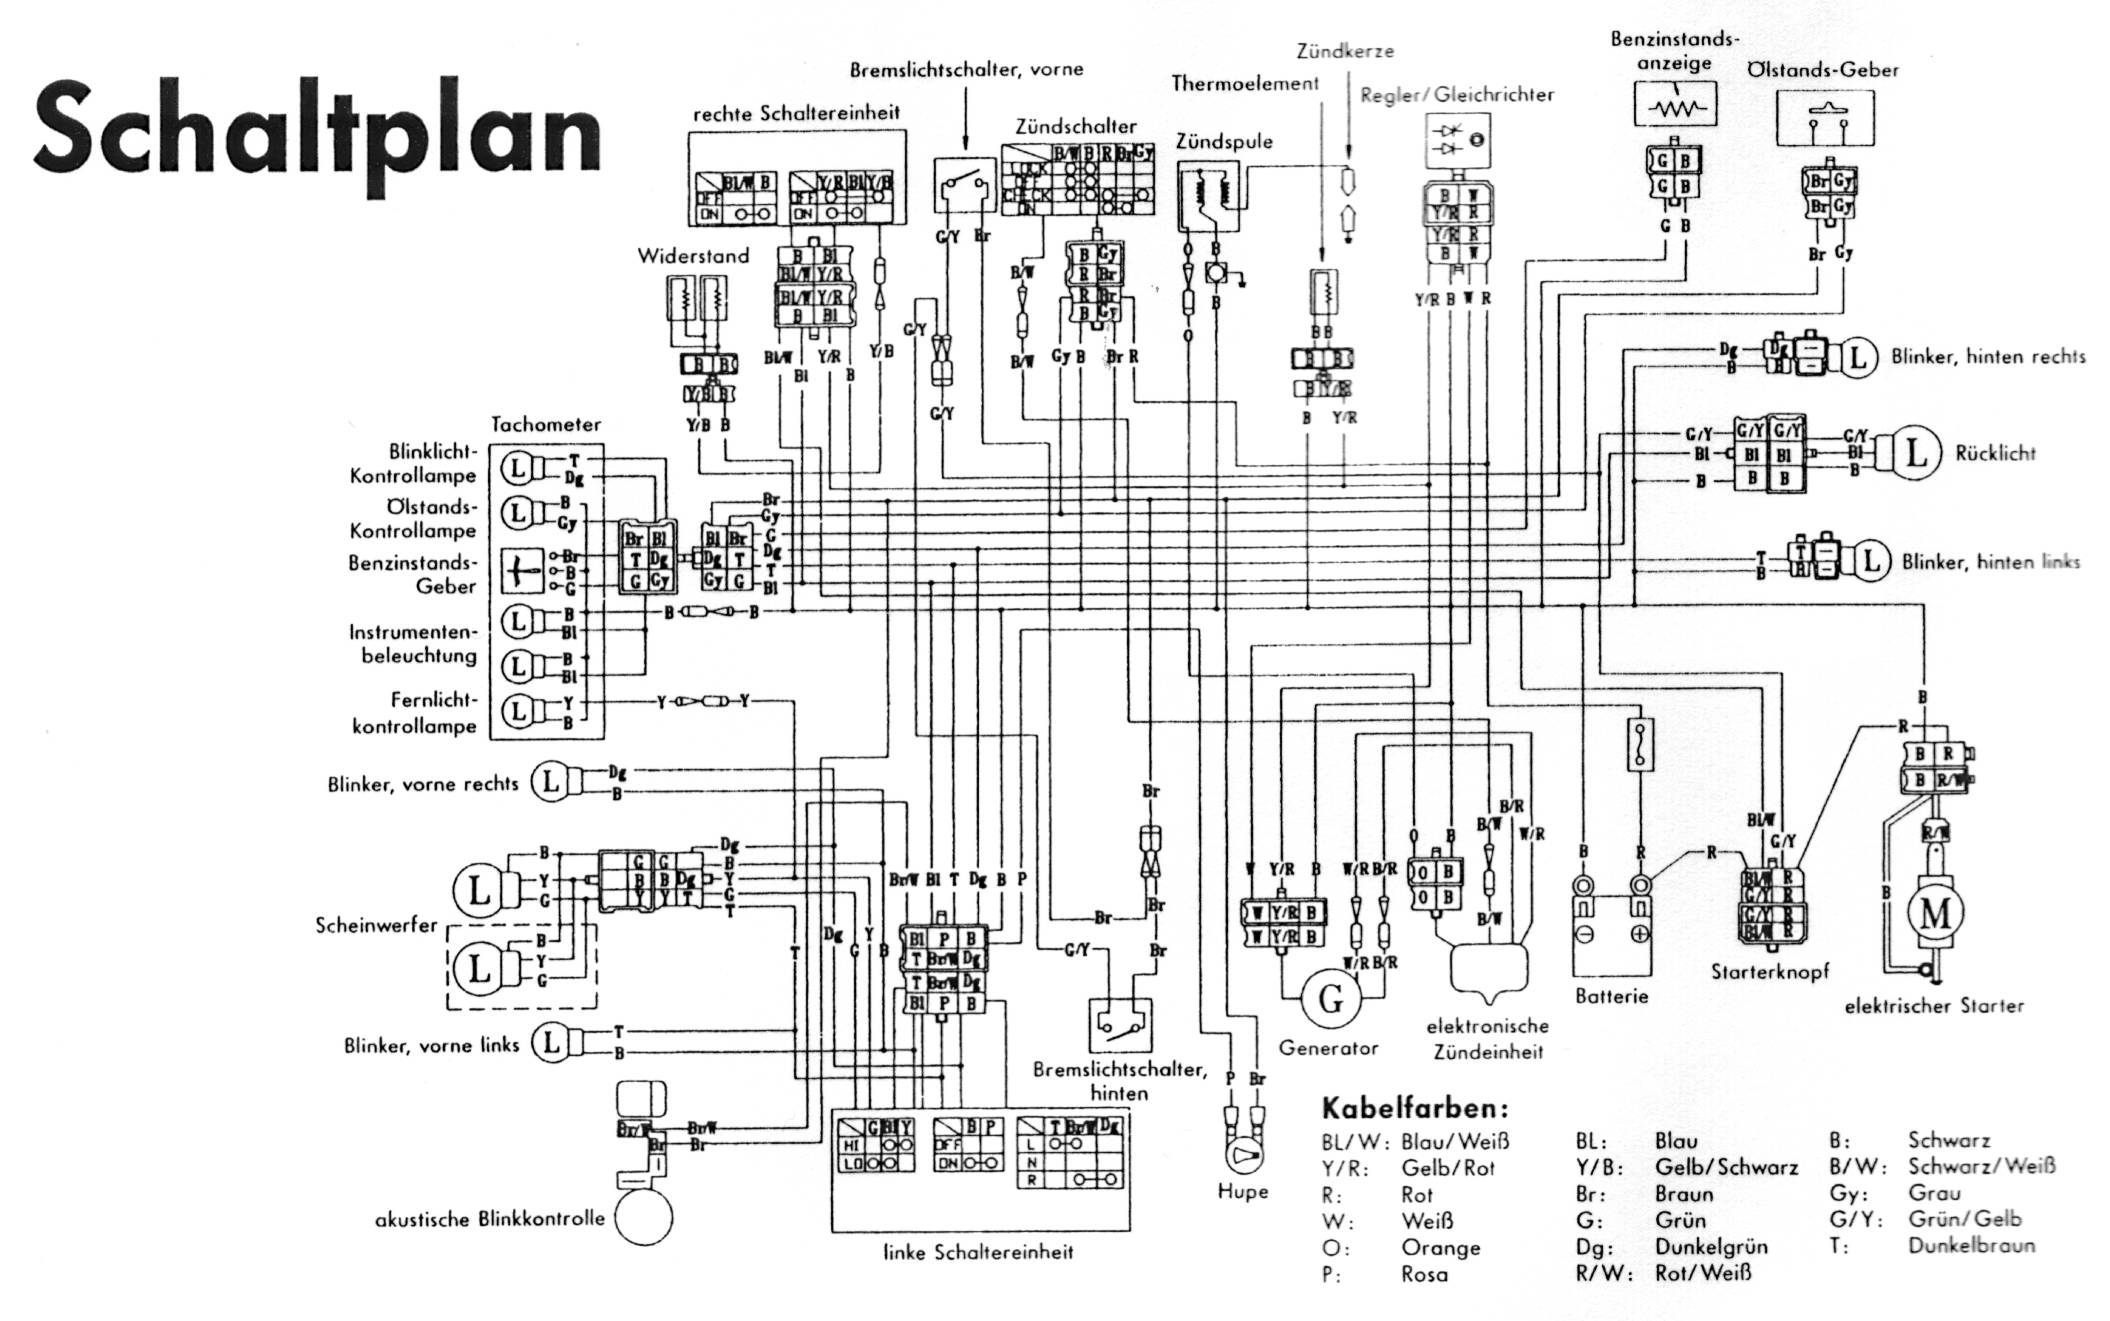 Großzügig 50cc Gy6 Roller Schaltplan Ideen - Der Schaltplan ...